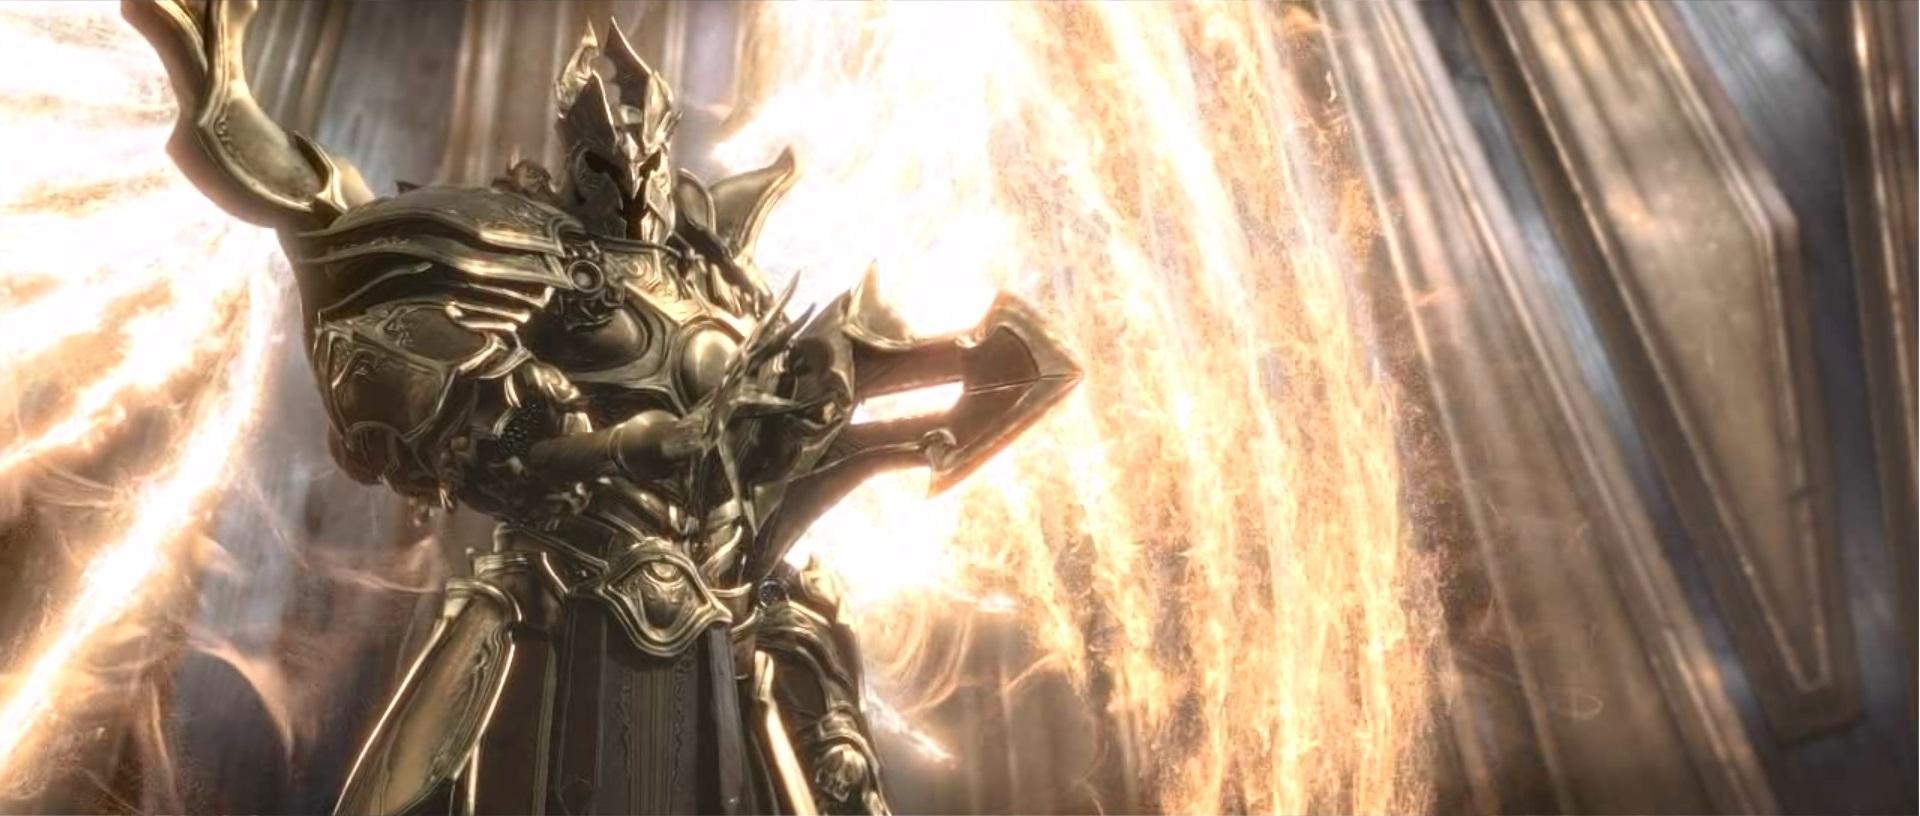 Diablo III 2012 05 16 17 19 39 4